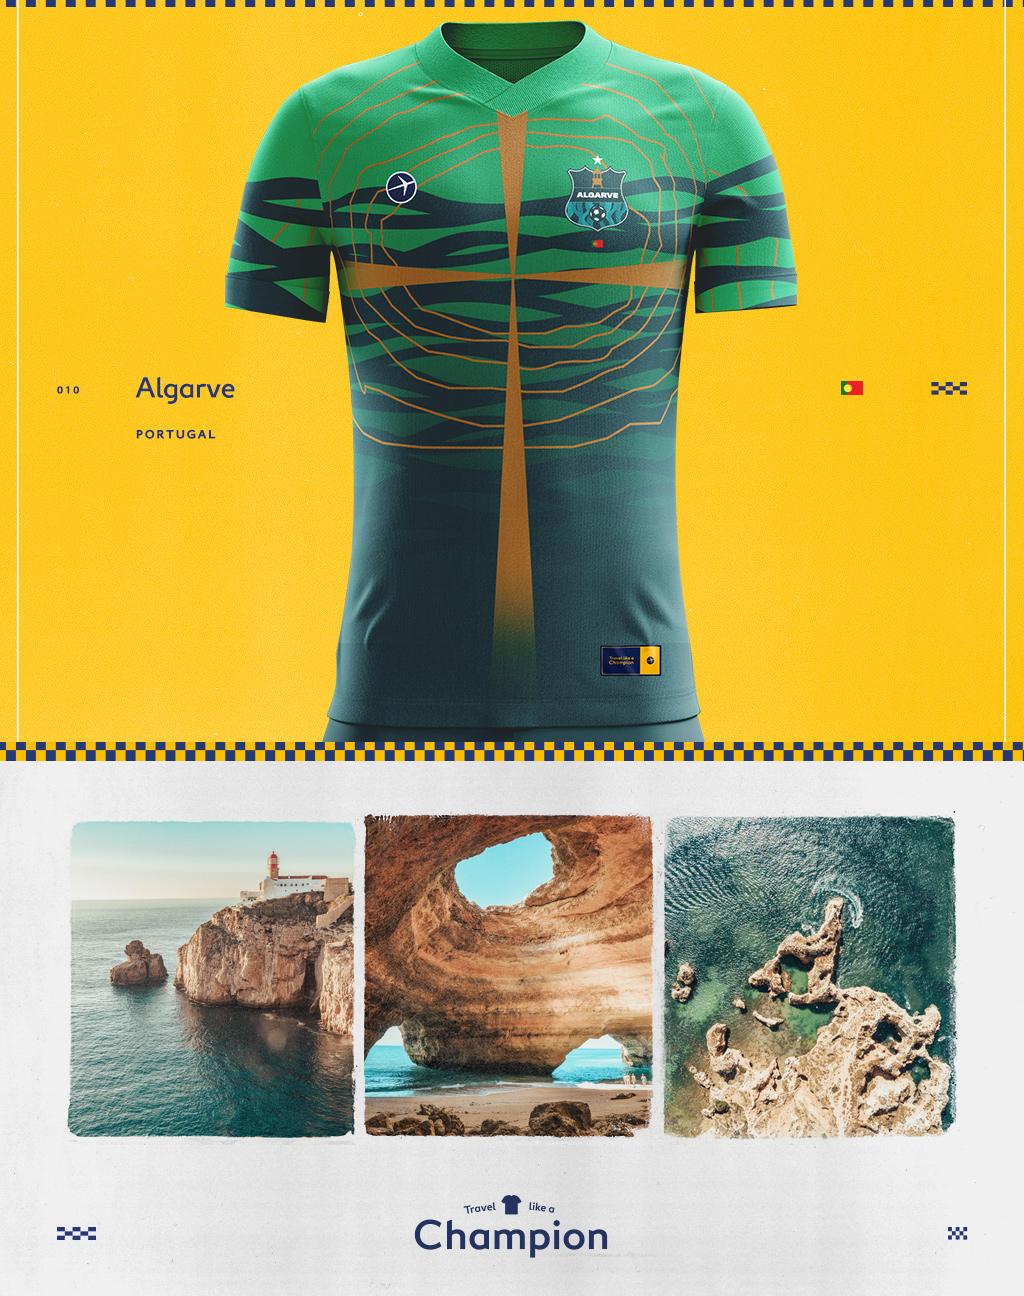 010-algarve-blog-article-1024x1296-fr.jpg?1556232098